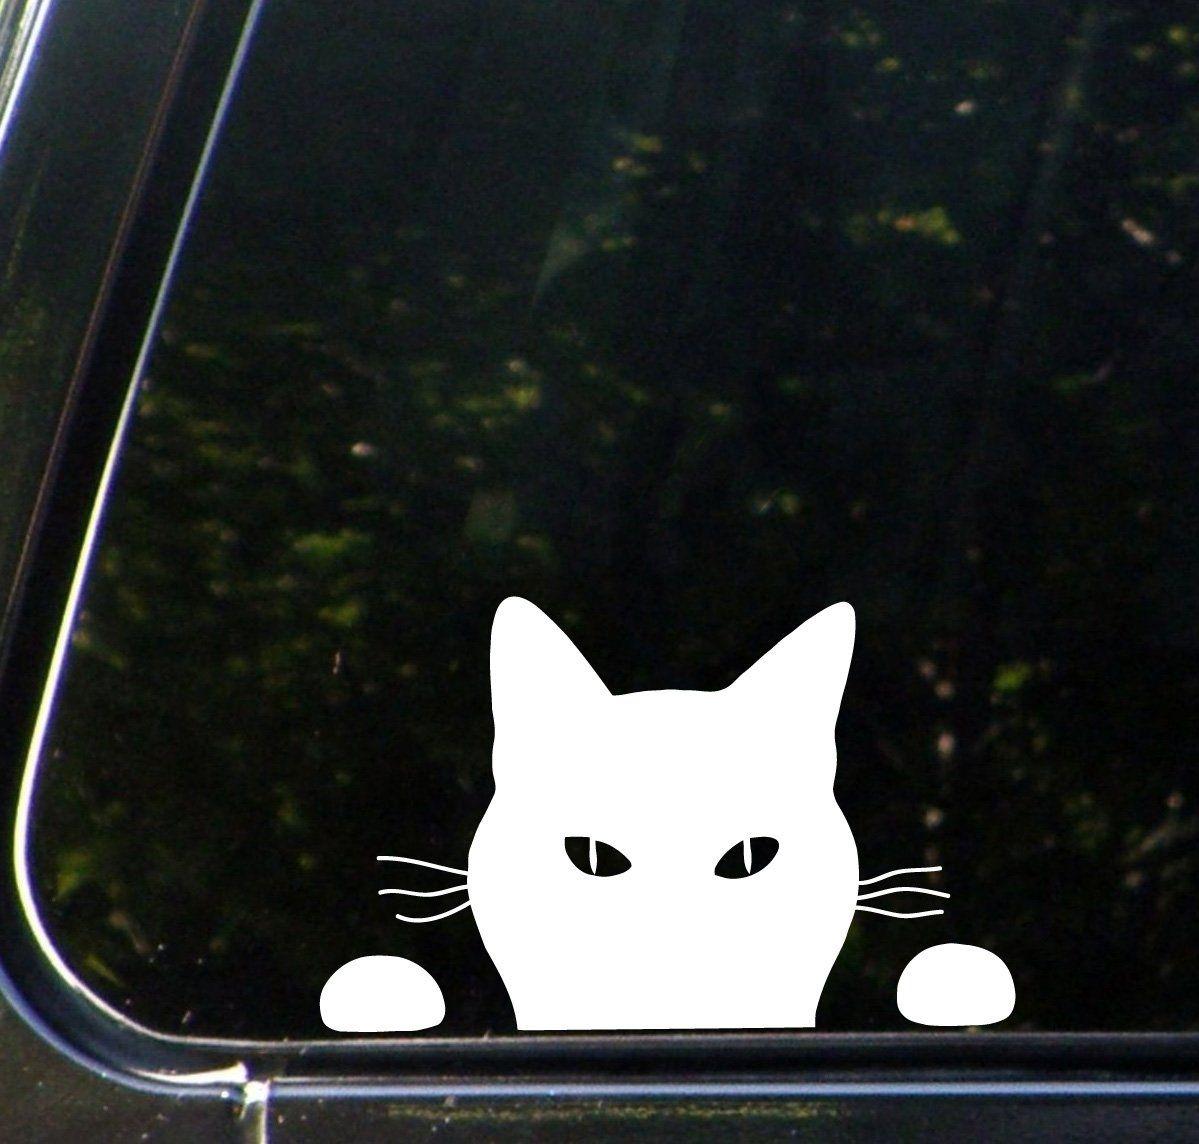 Amazon Com Cat Watching Car Vinyl Decal Sticker 7 25 W X 4 5 H Copyright C Yadda Yadda Design Co White Au White Cat Car Decals Vinyl Kitten Stickers [ 1144 x 1199 Pixel ]